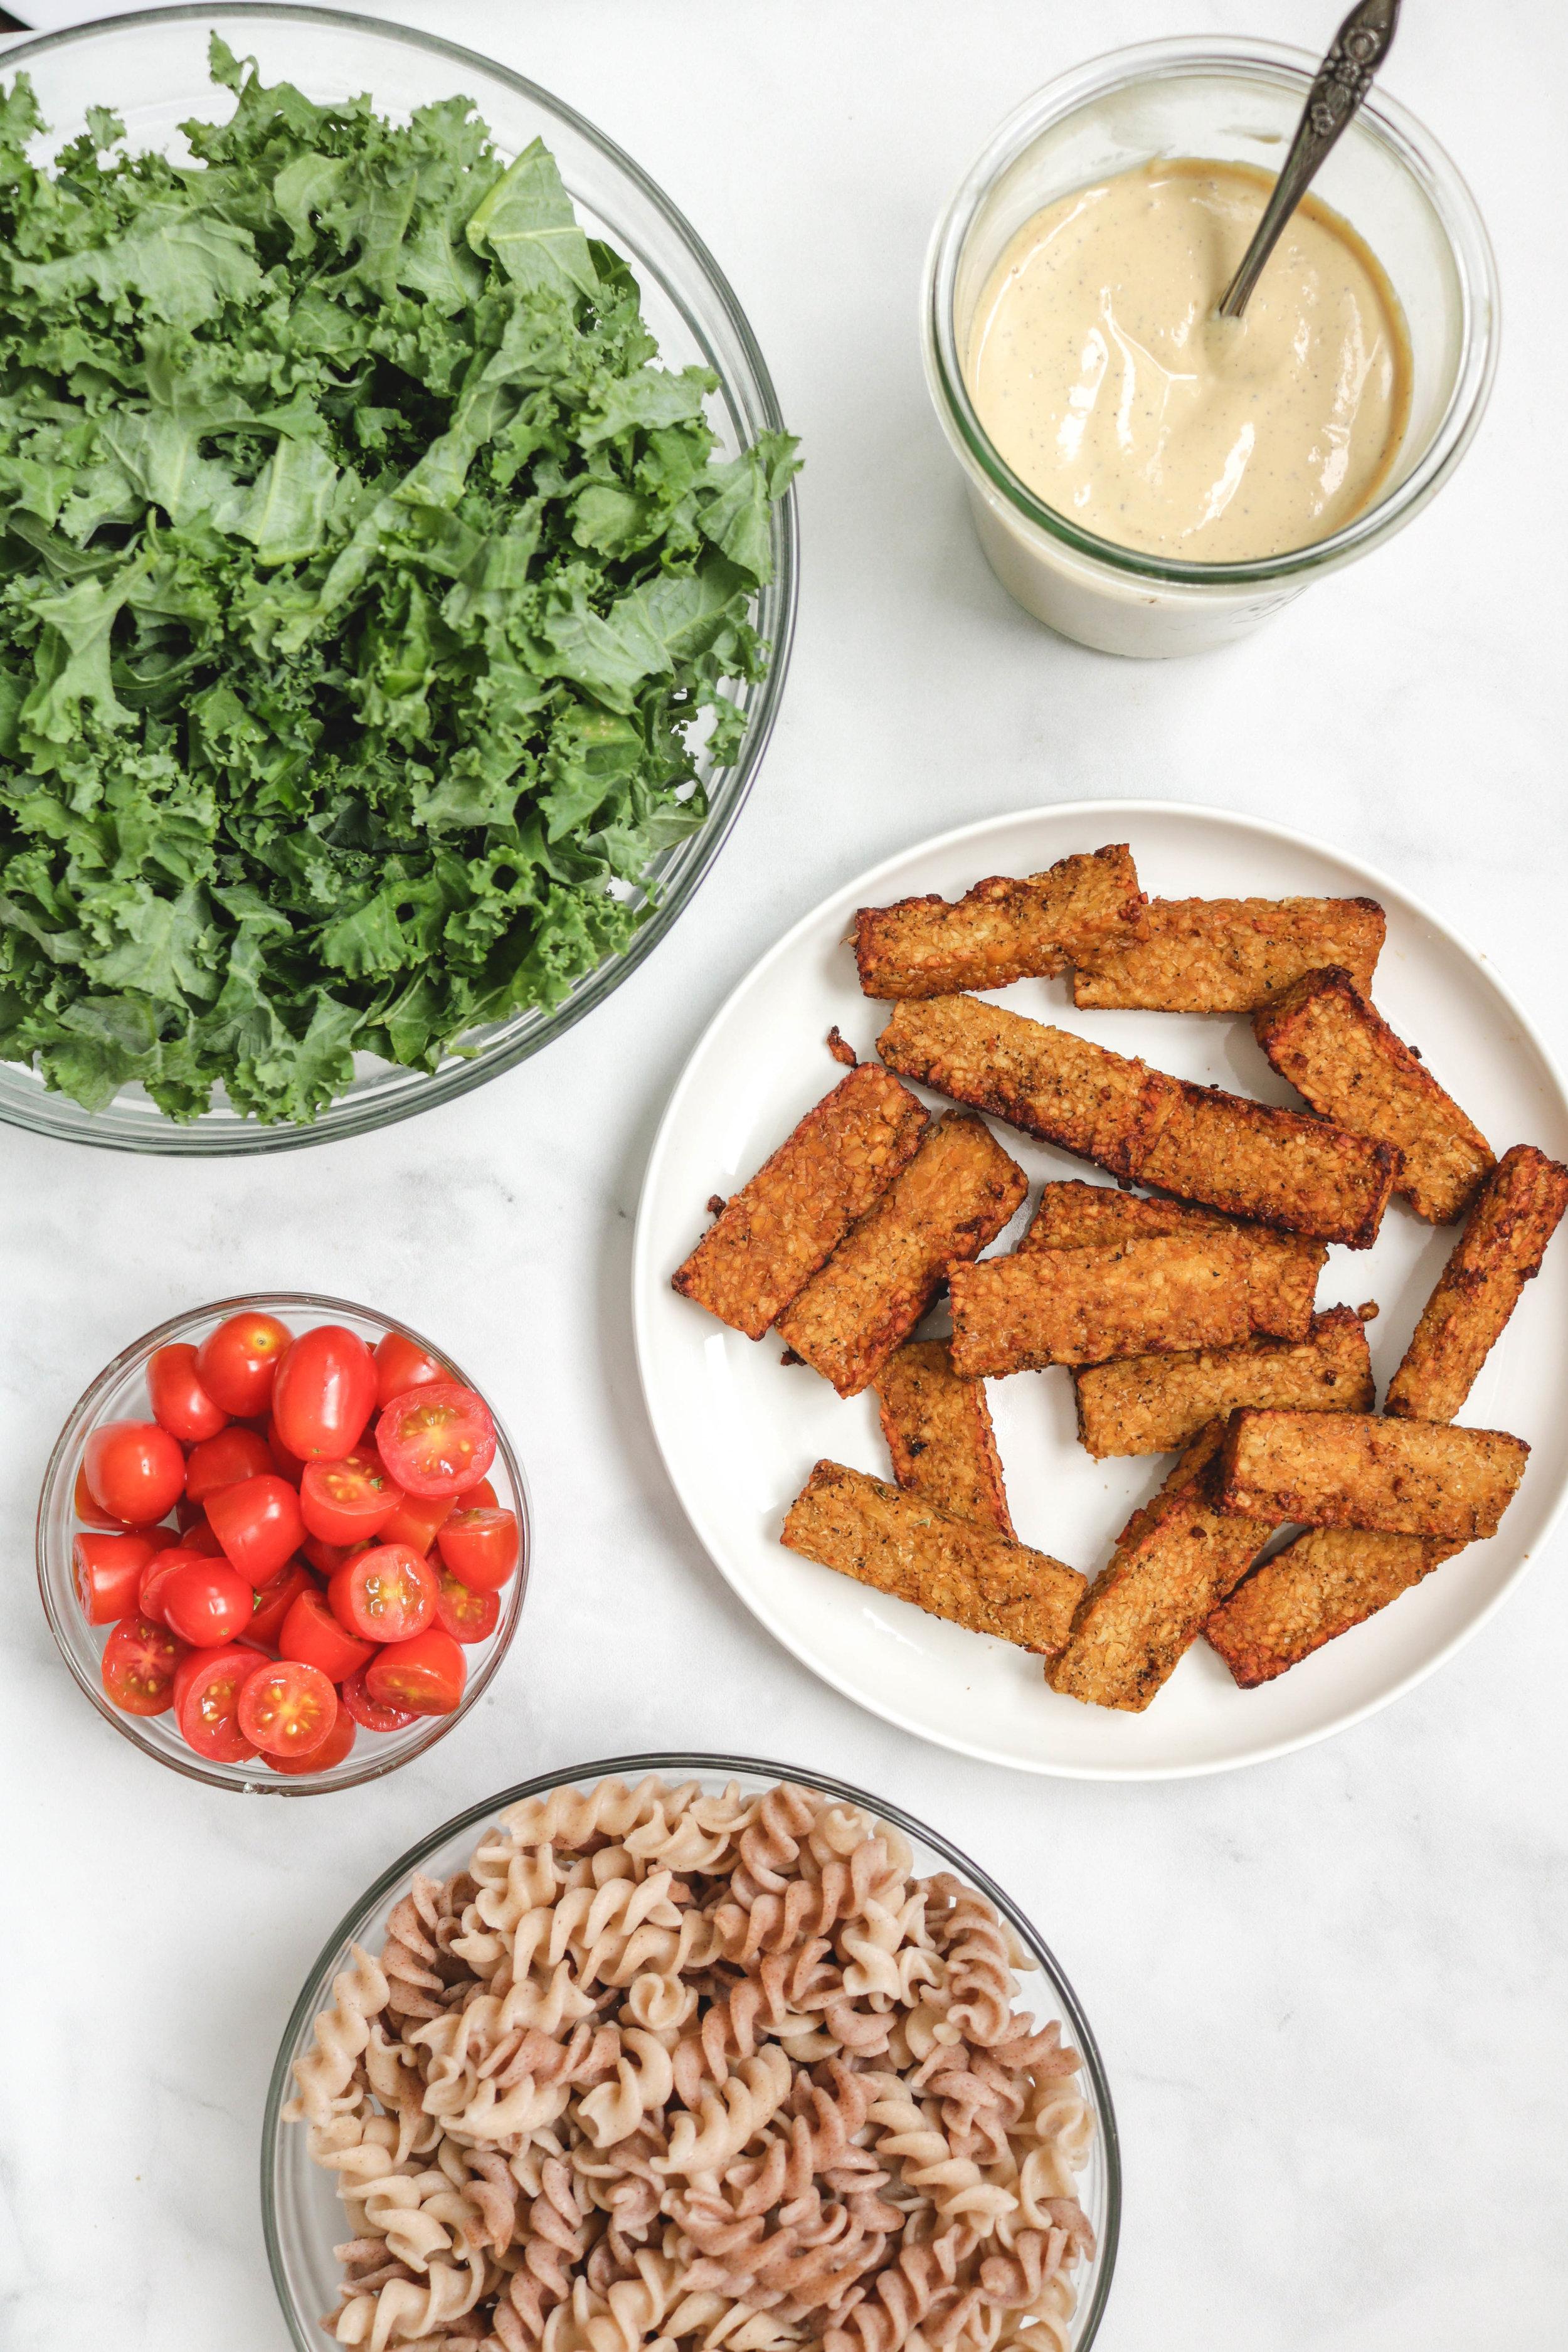 Kale Miso Caesar Pasta Salad with Smoky Tempeh ingredients